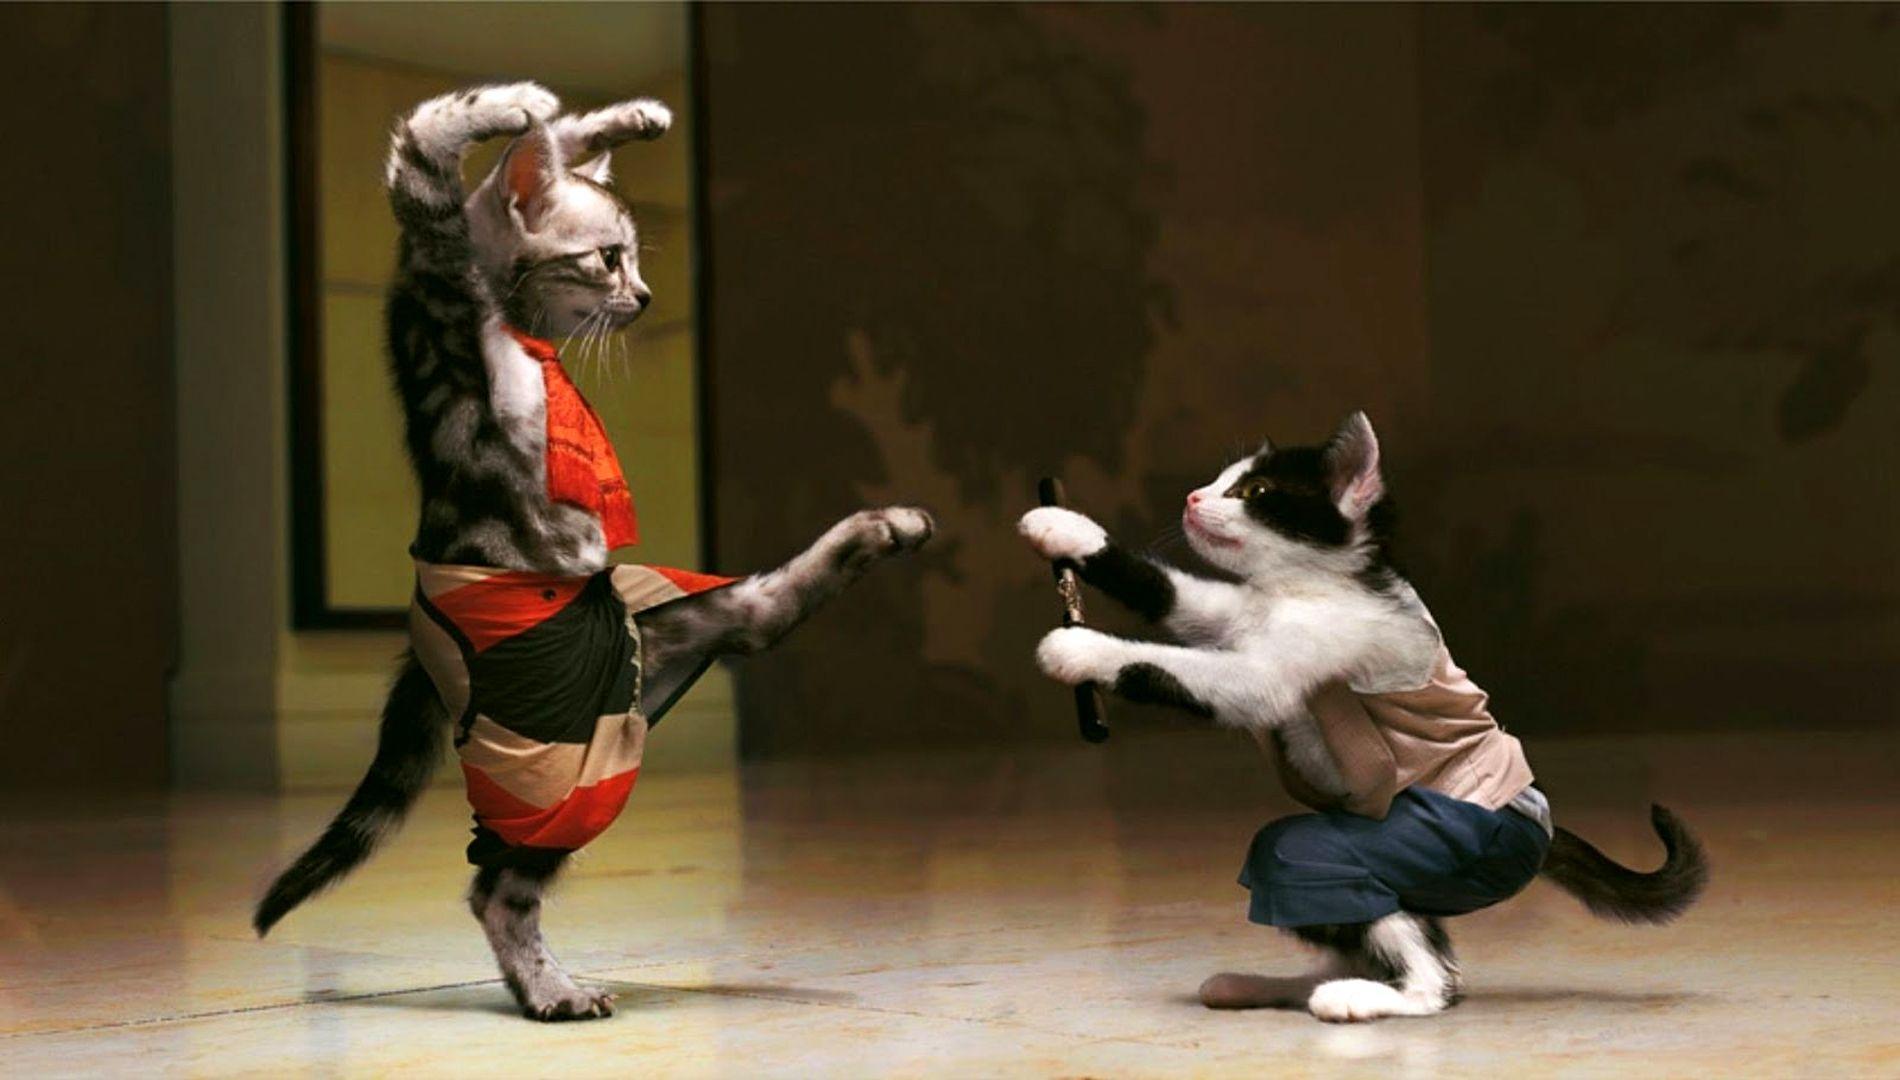 Funny Cats Wallpapers - Wallpaper Cave